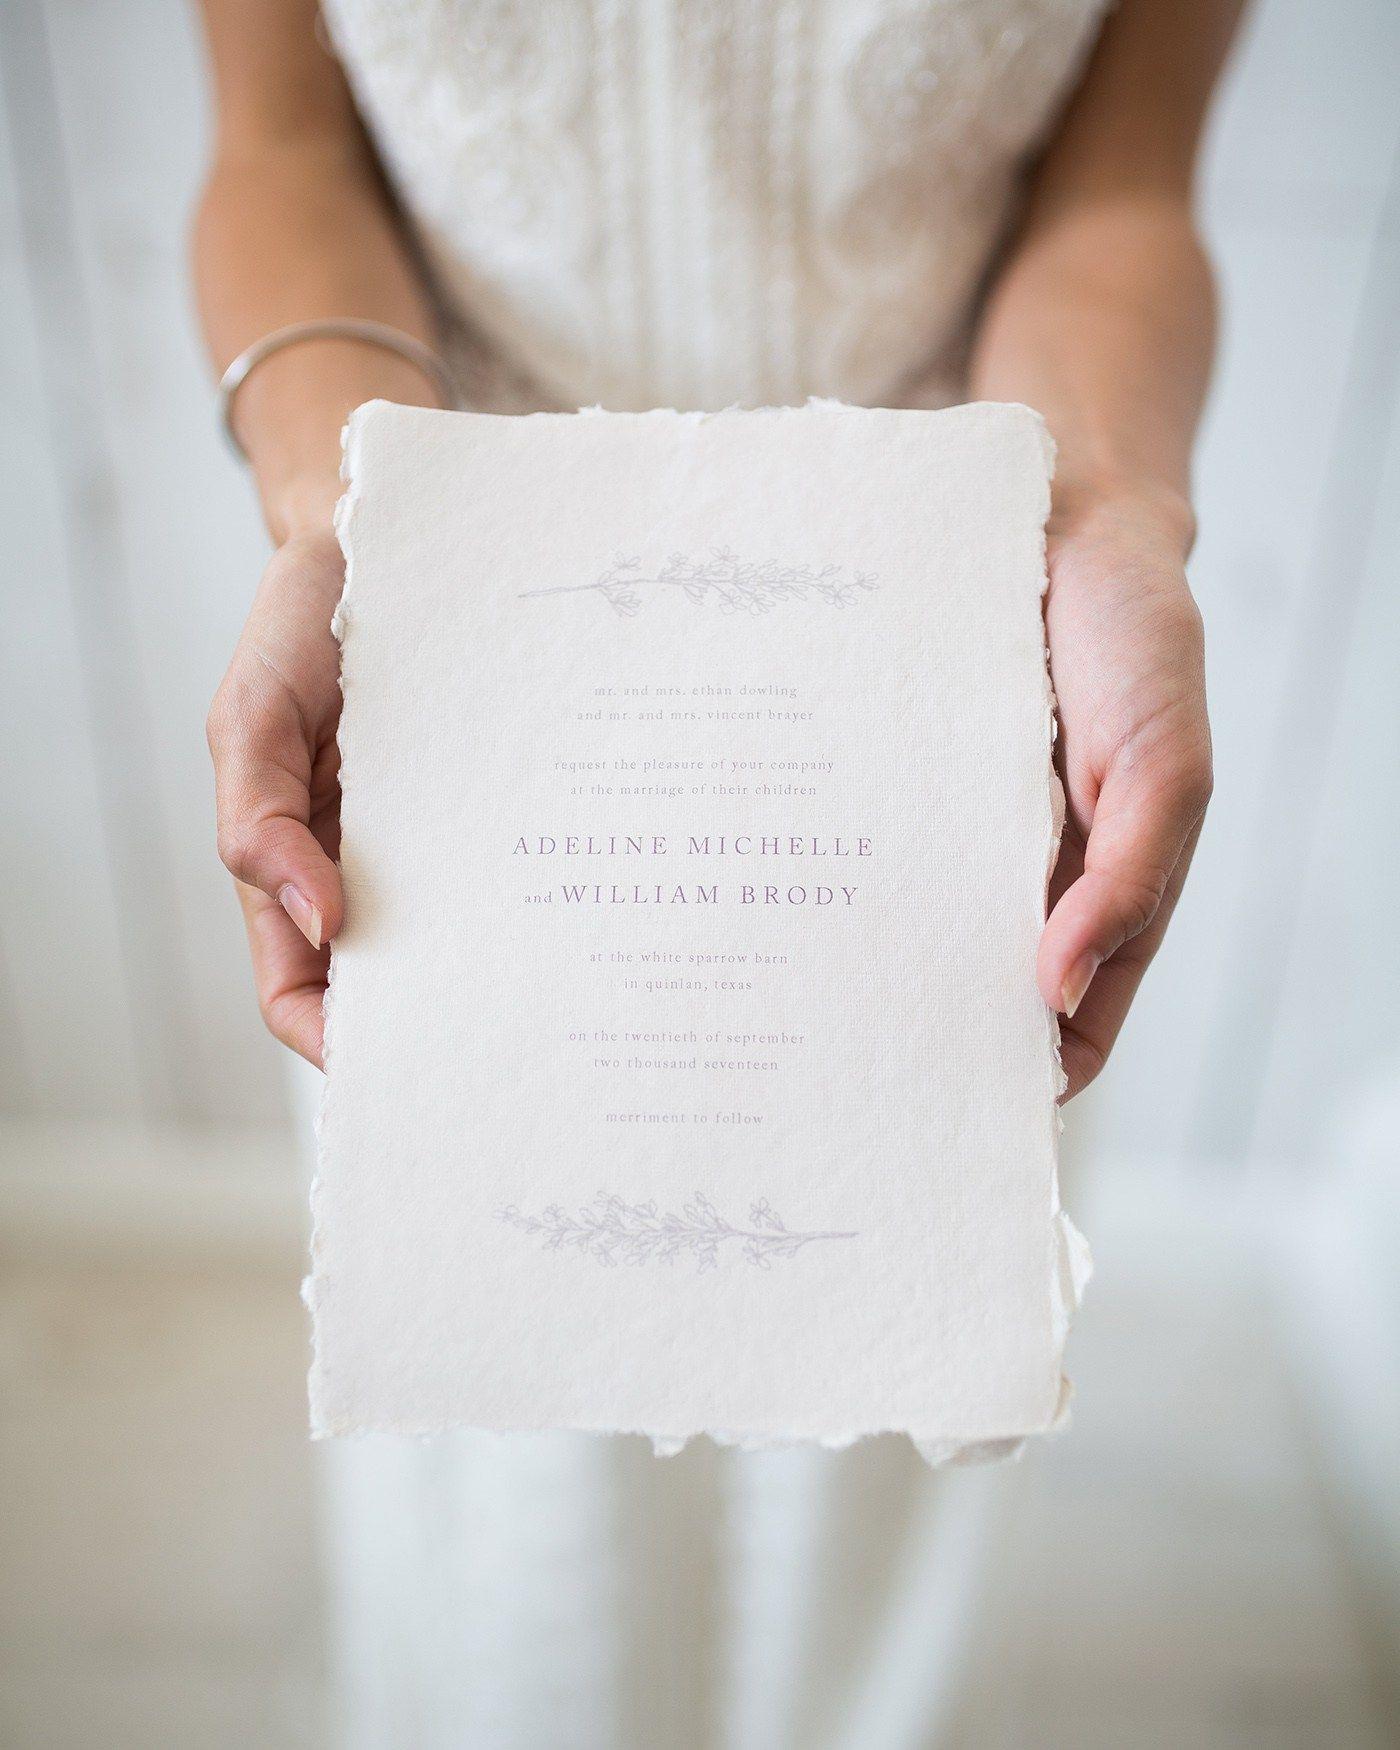 Wedding Stationery Styling at La Reverie Workshop // Sarah Ann Design